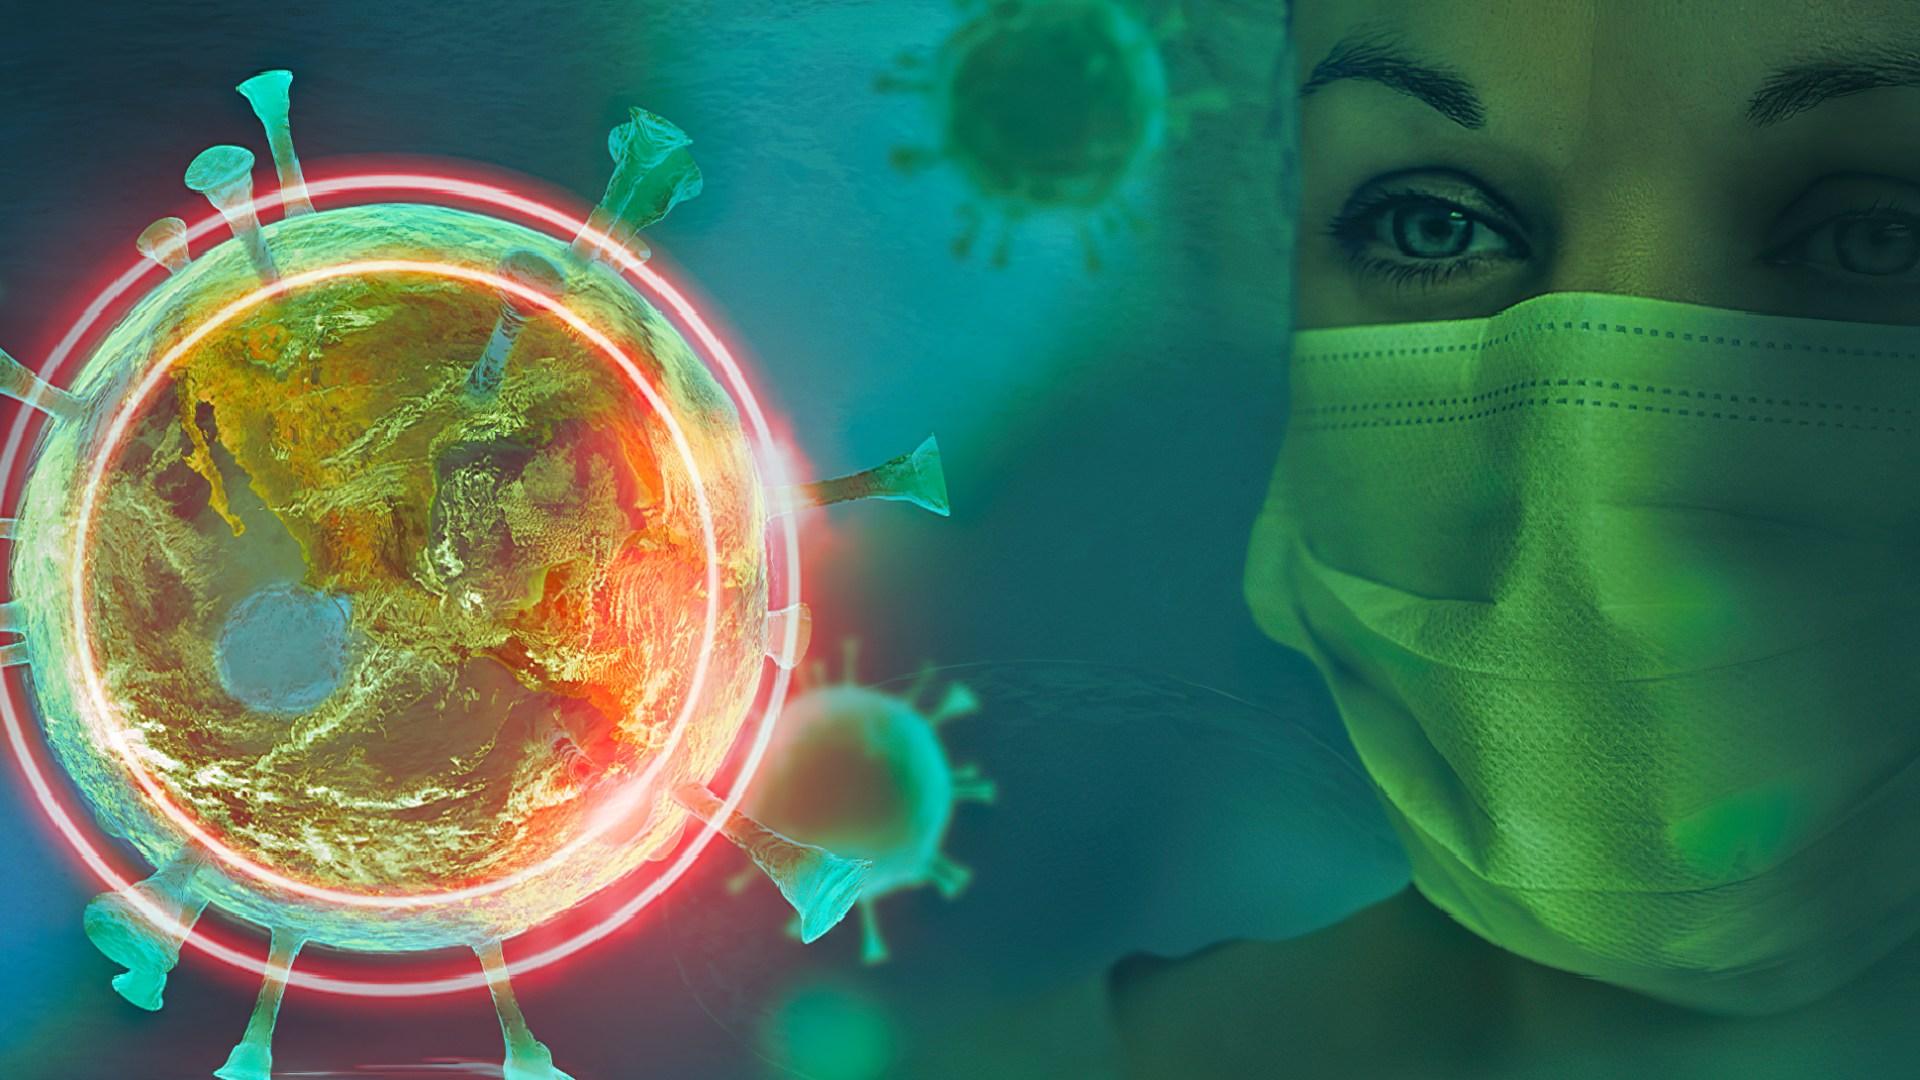 Virus, Coronavirus, Corona, Covid-19, Coronakrise, Forscher, SARS-CoV-2, BioWare, Corona-Virus, Pandemie, Covid-2019, Biologie, Covid, Covid19, Covid-19-Tracker, Biohacking, Zelle, Krank, Viruszelle, Grippe, SARS, Erkrankung, Pandemic